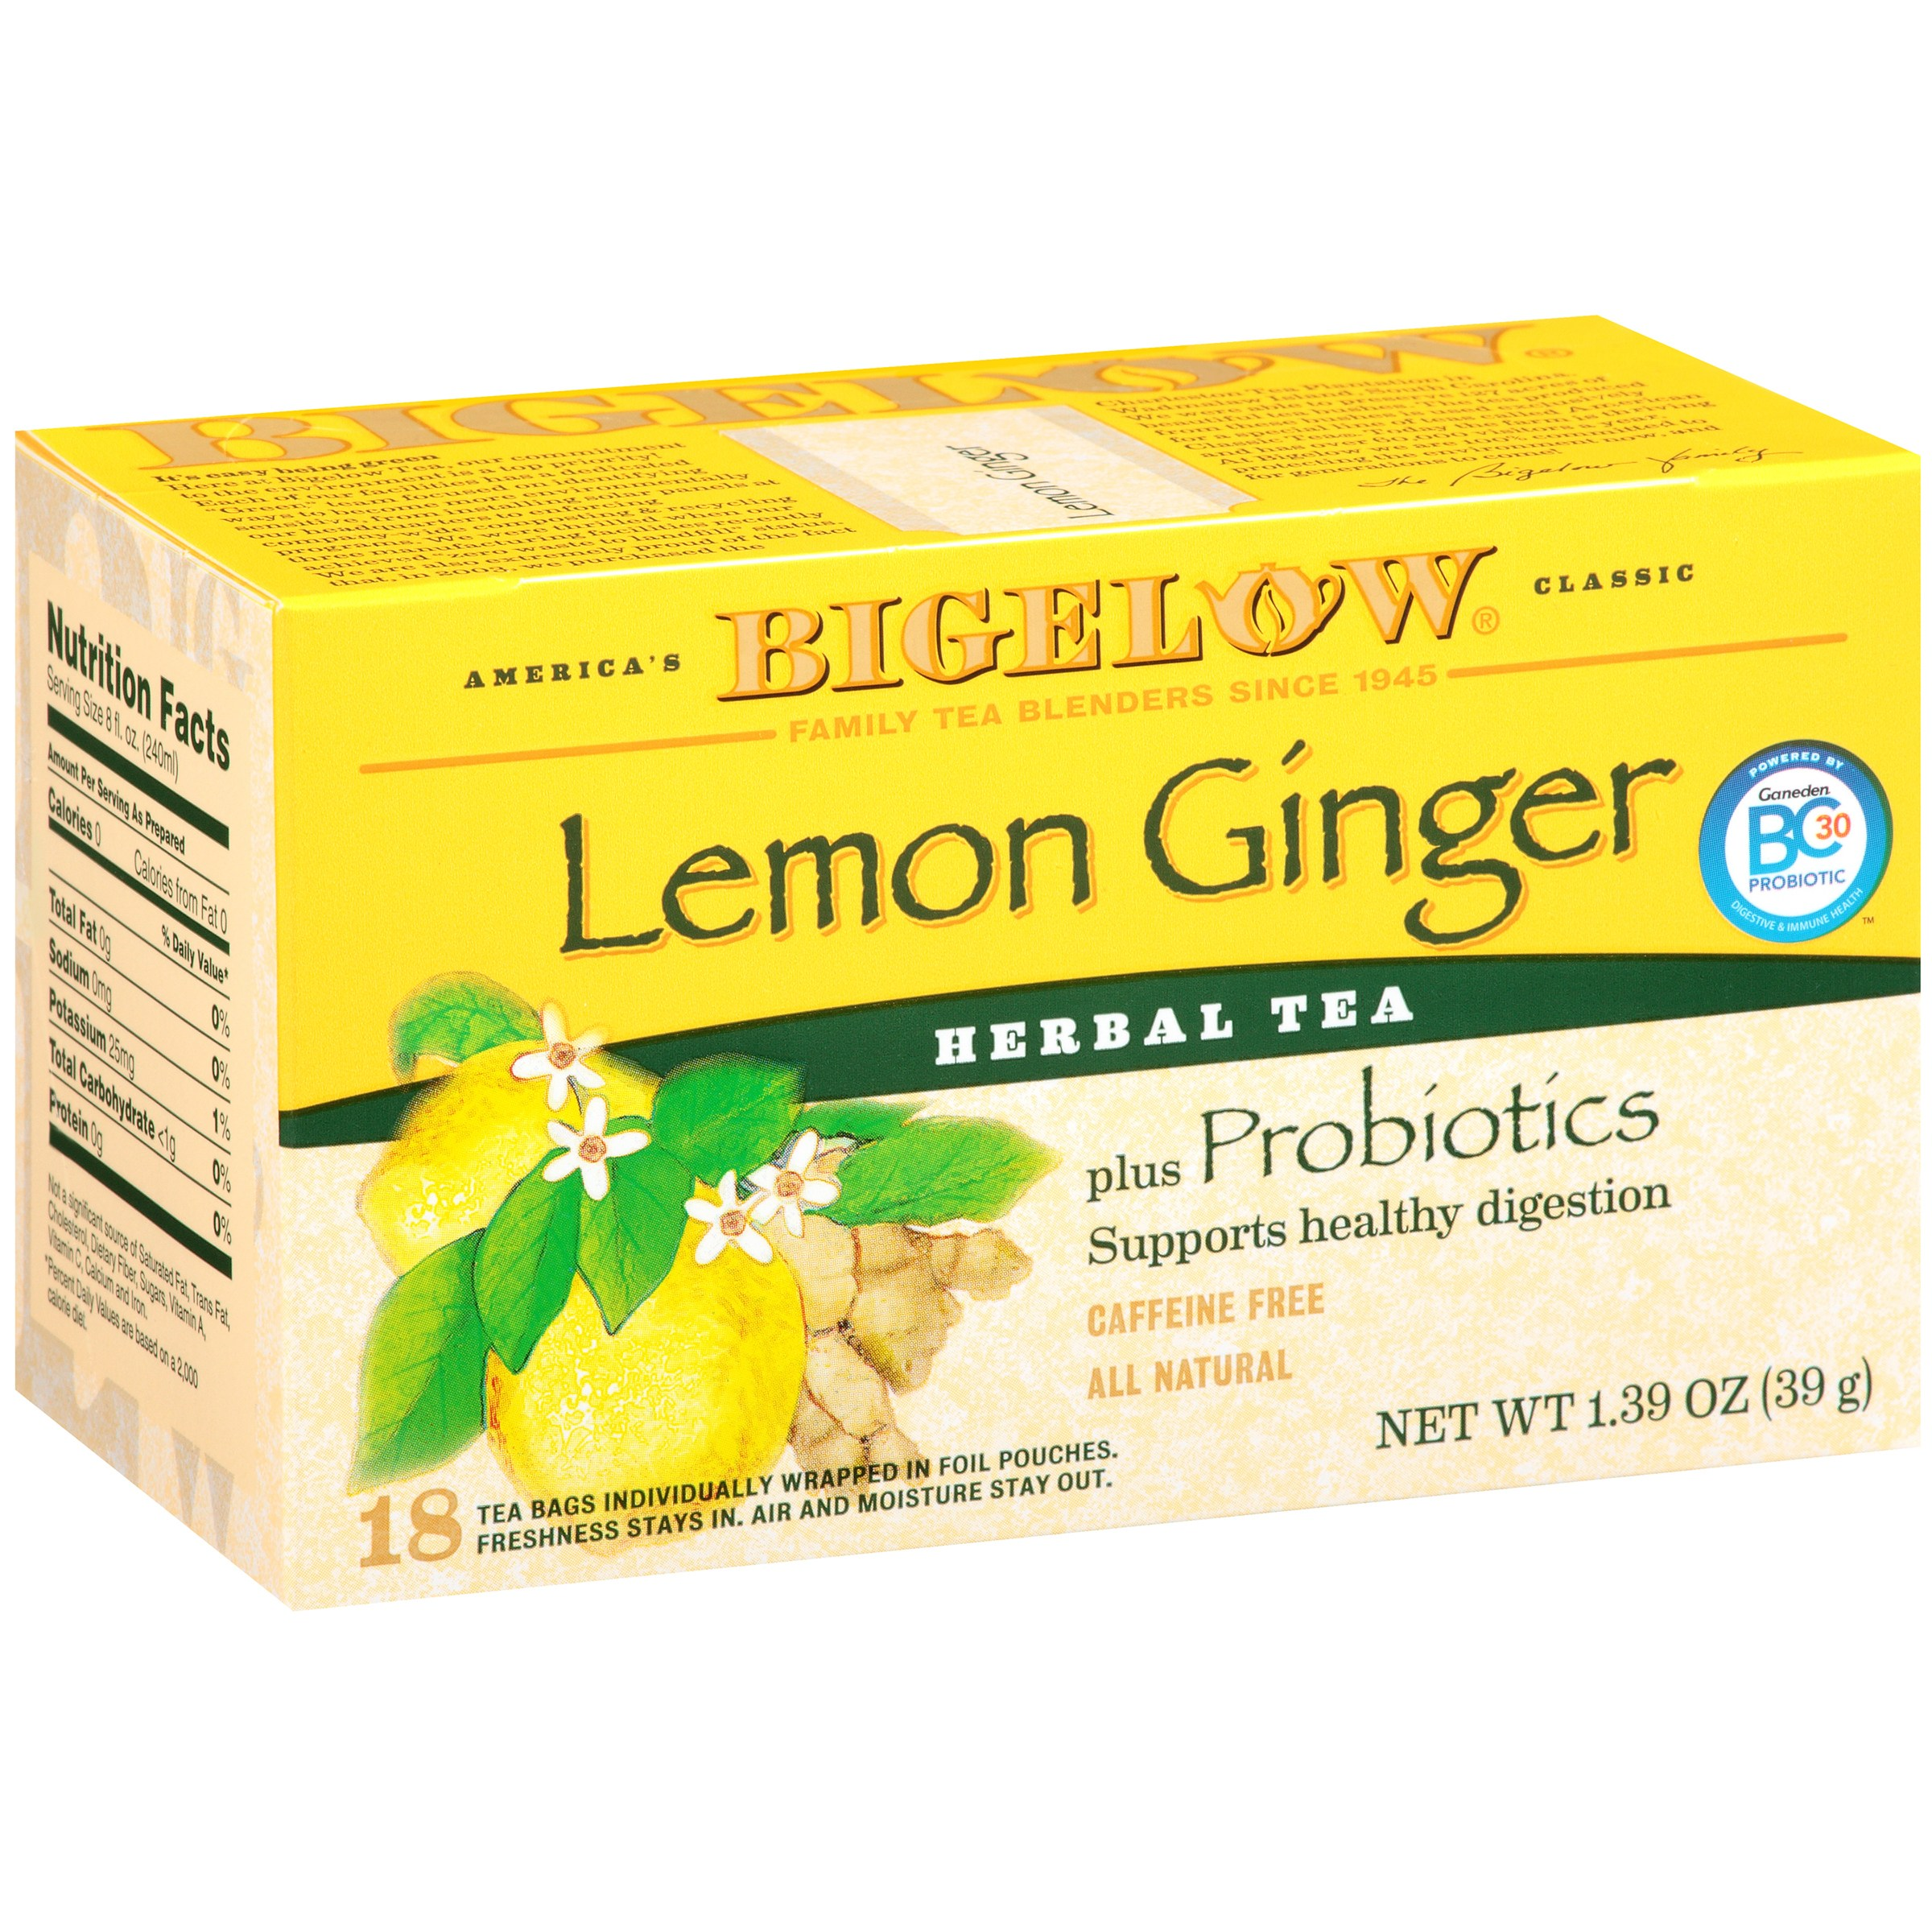 Bigelow Lemon Ginger Plus Probiotics Herbal Tea Bags, 18 ct, 1.39 oz by RC Bigelow, Inc.